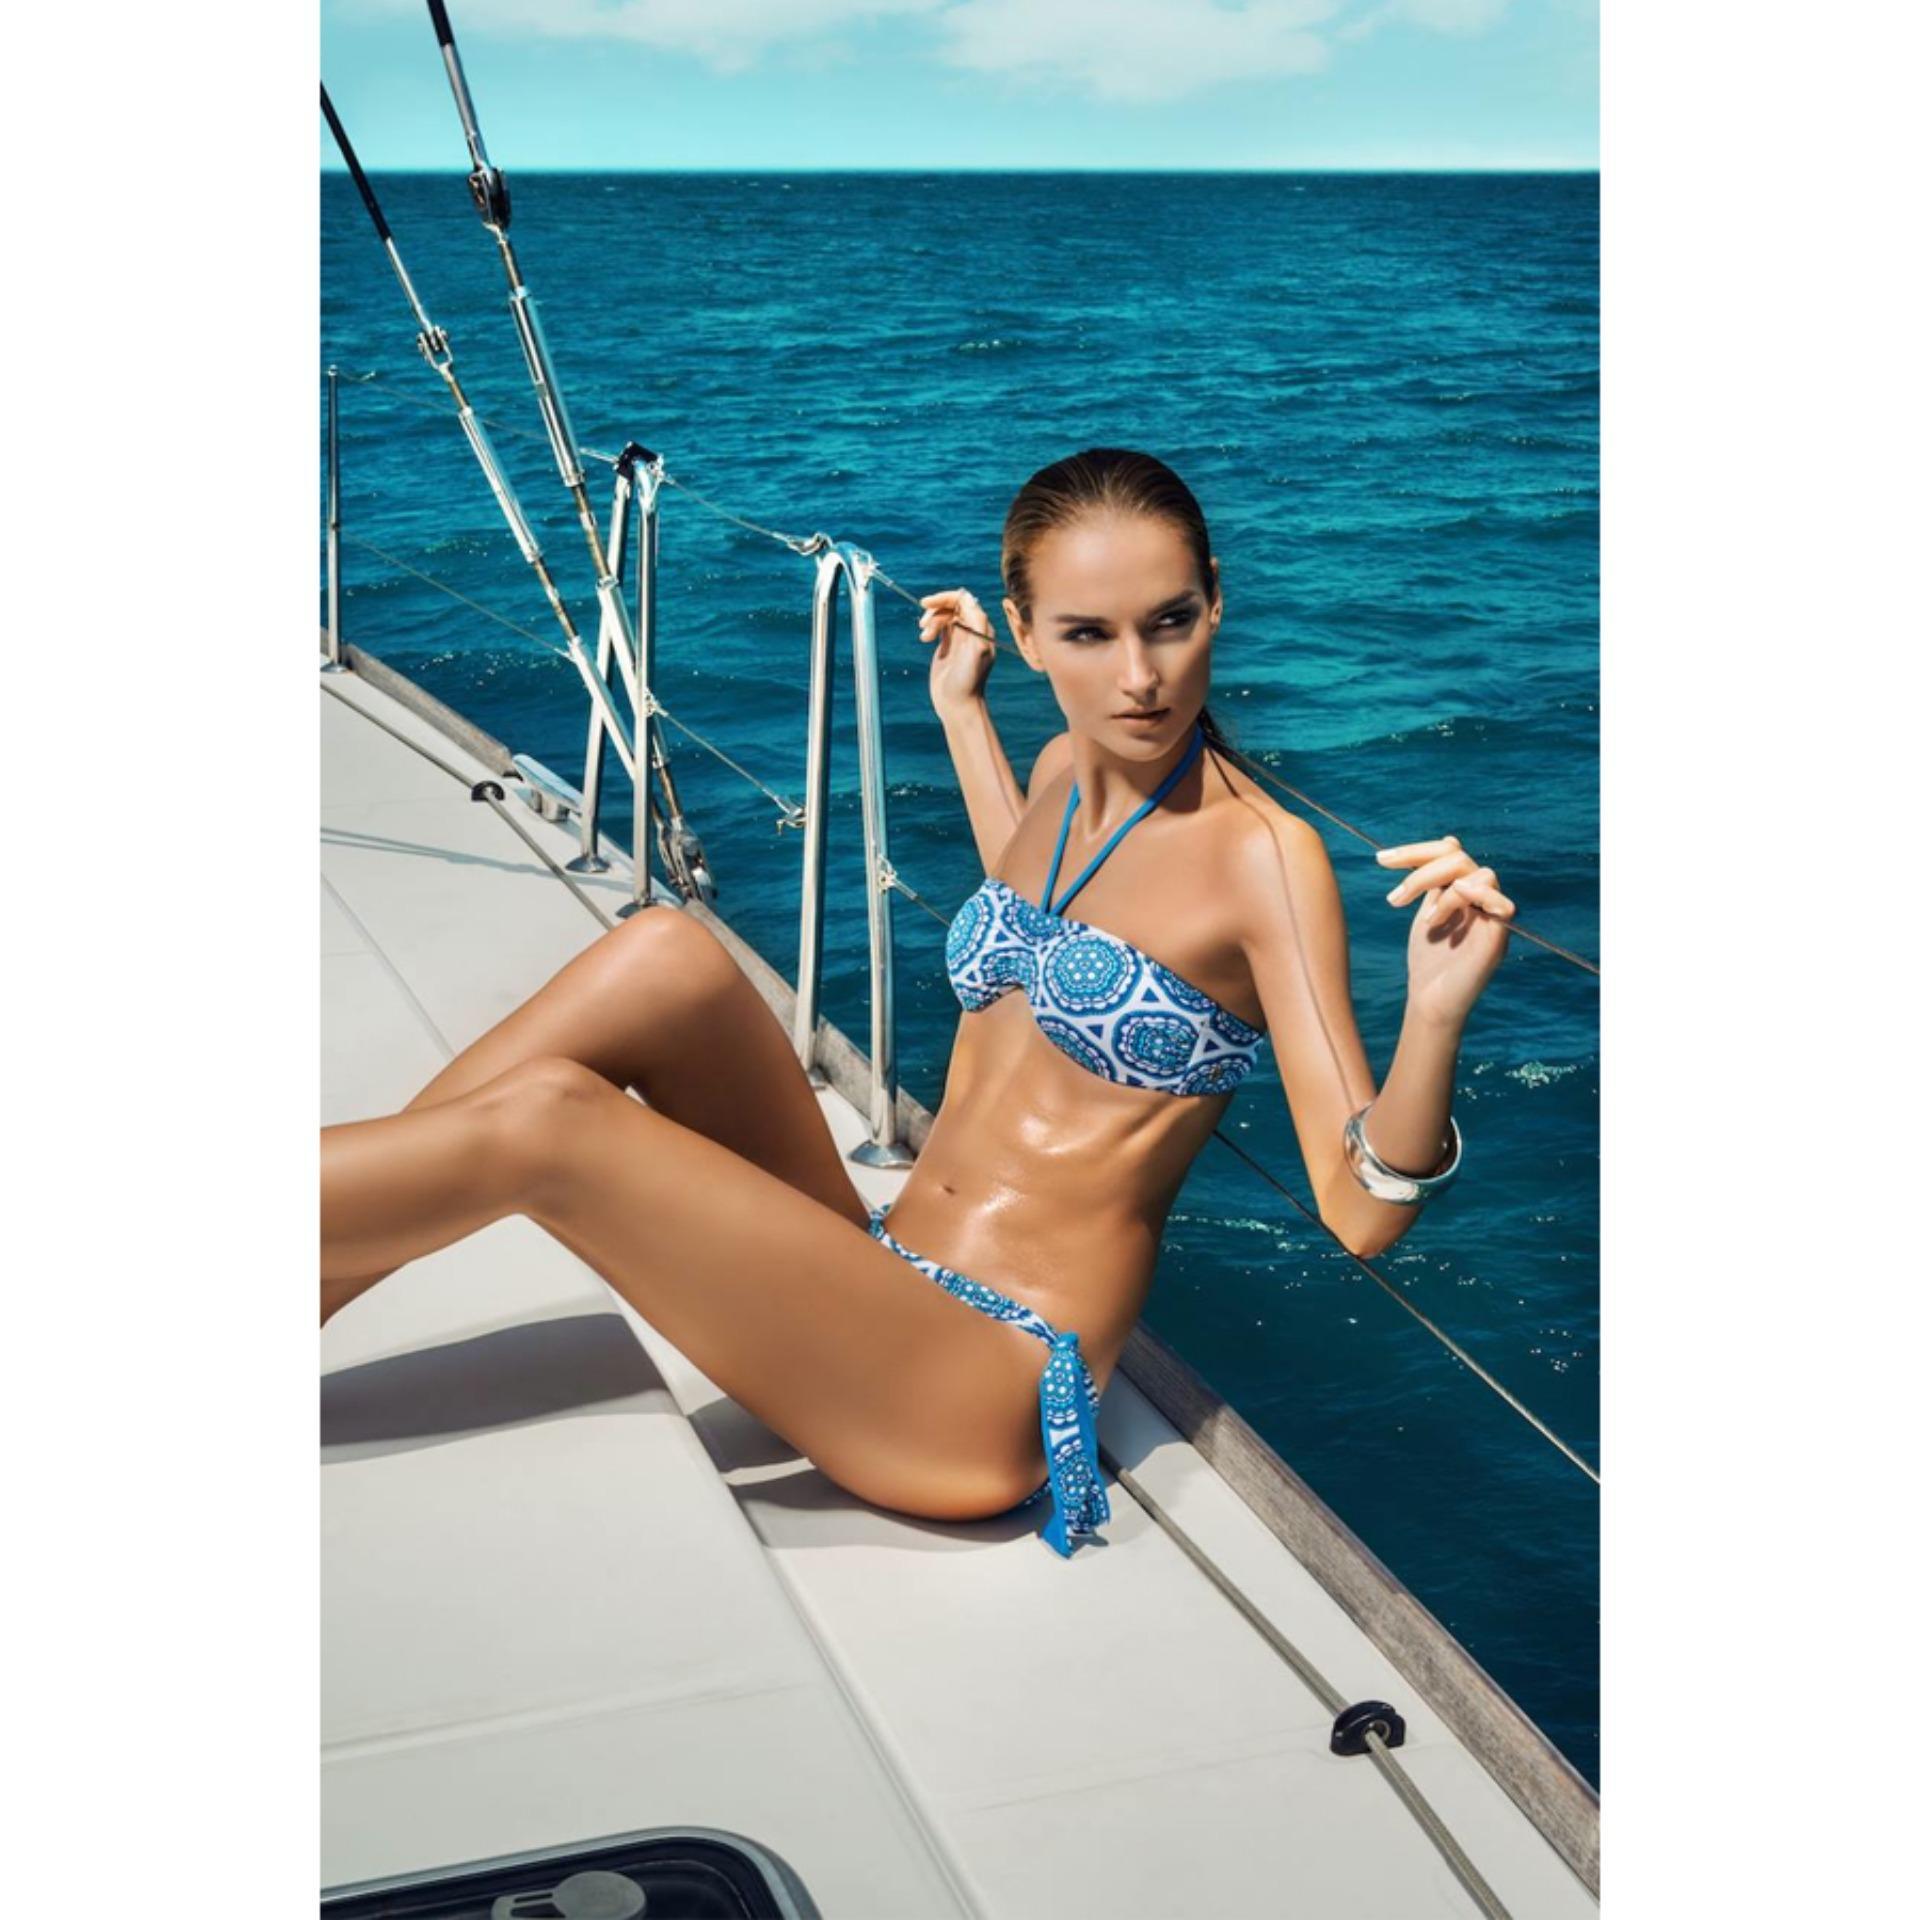 957b6f66b5 KBLU Womens Blue Gem Print Bandeau Halter Bikini Beach Swim Wear Padded Bra  Top